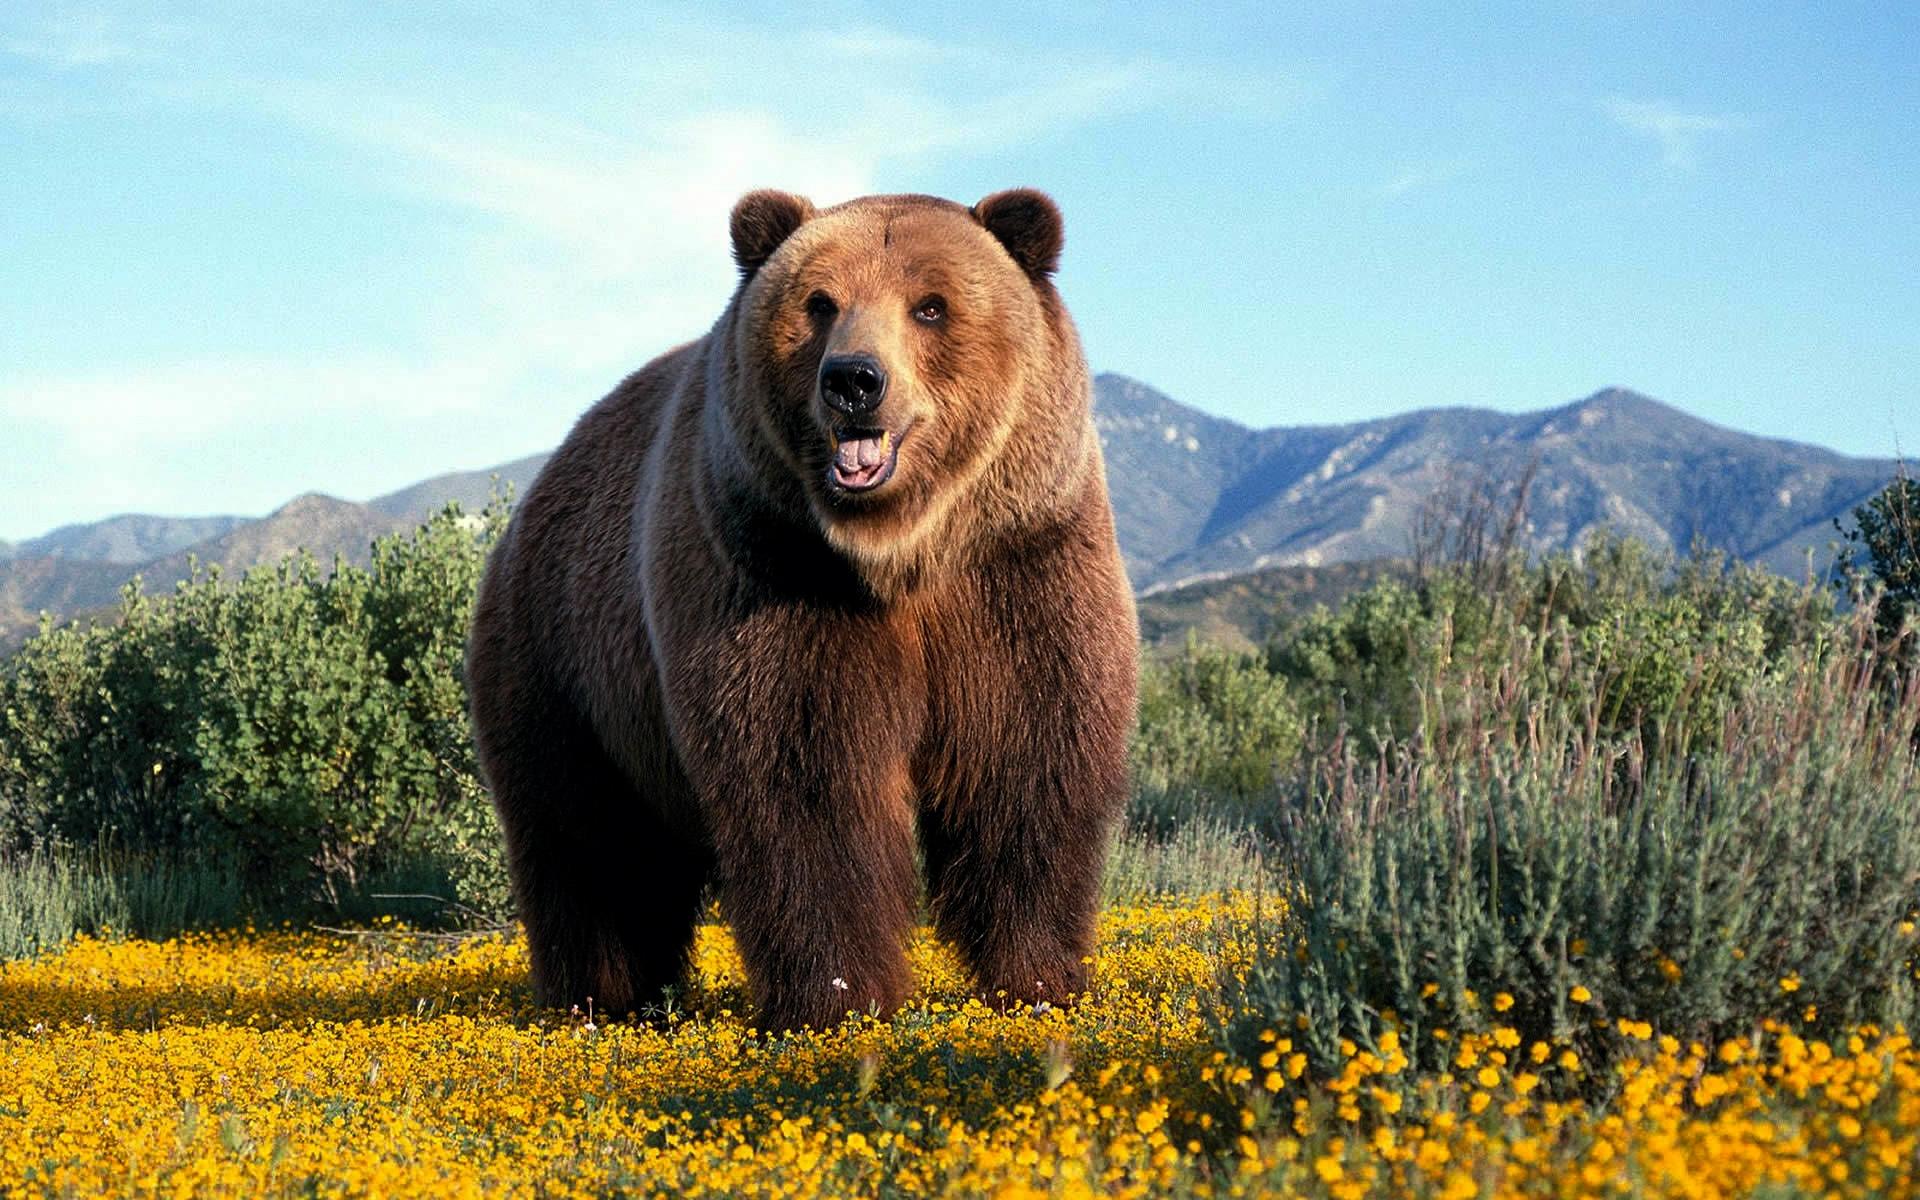 Grizzly Bear Wallpaper · Grizzly Bear Wallpaper ...